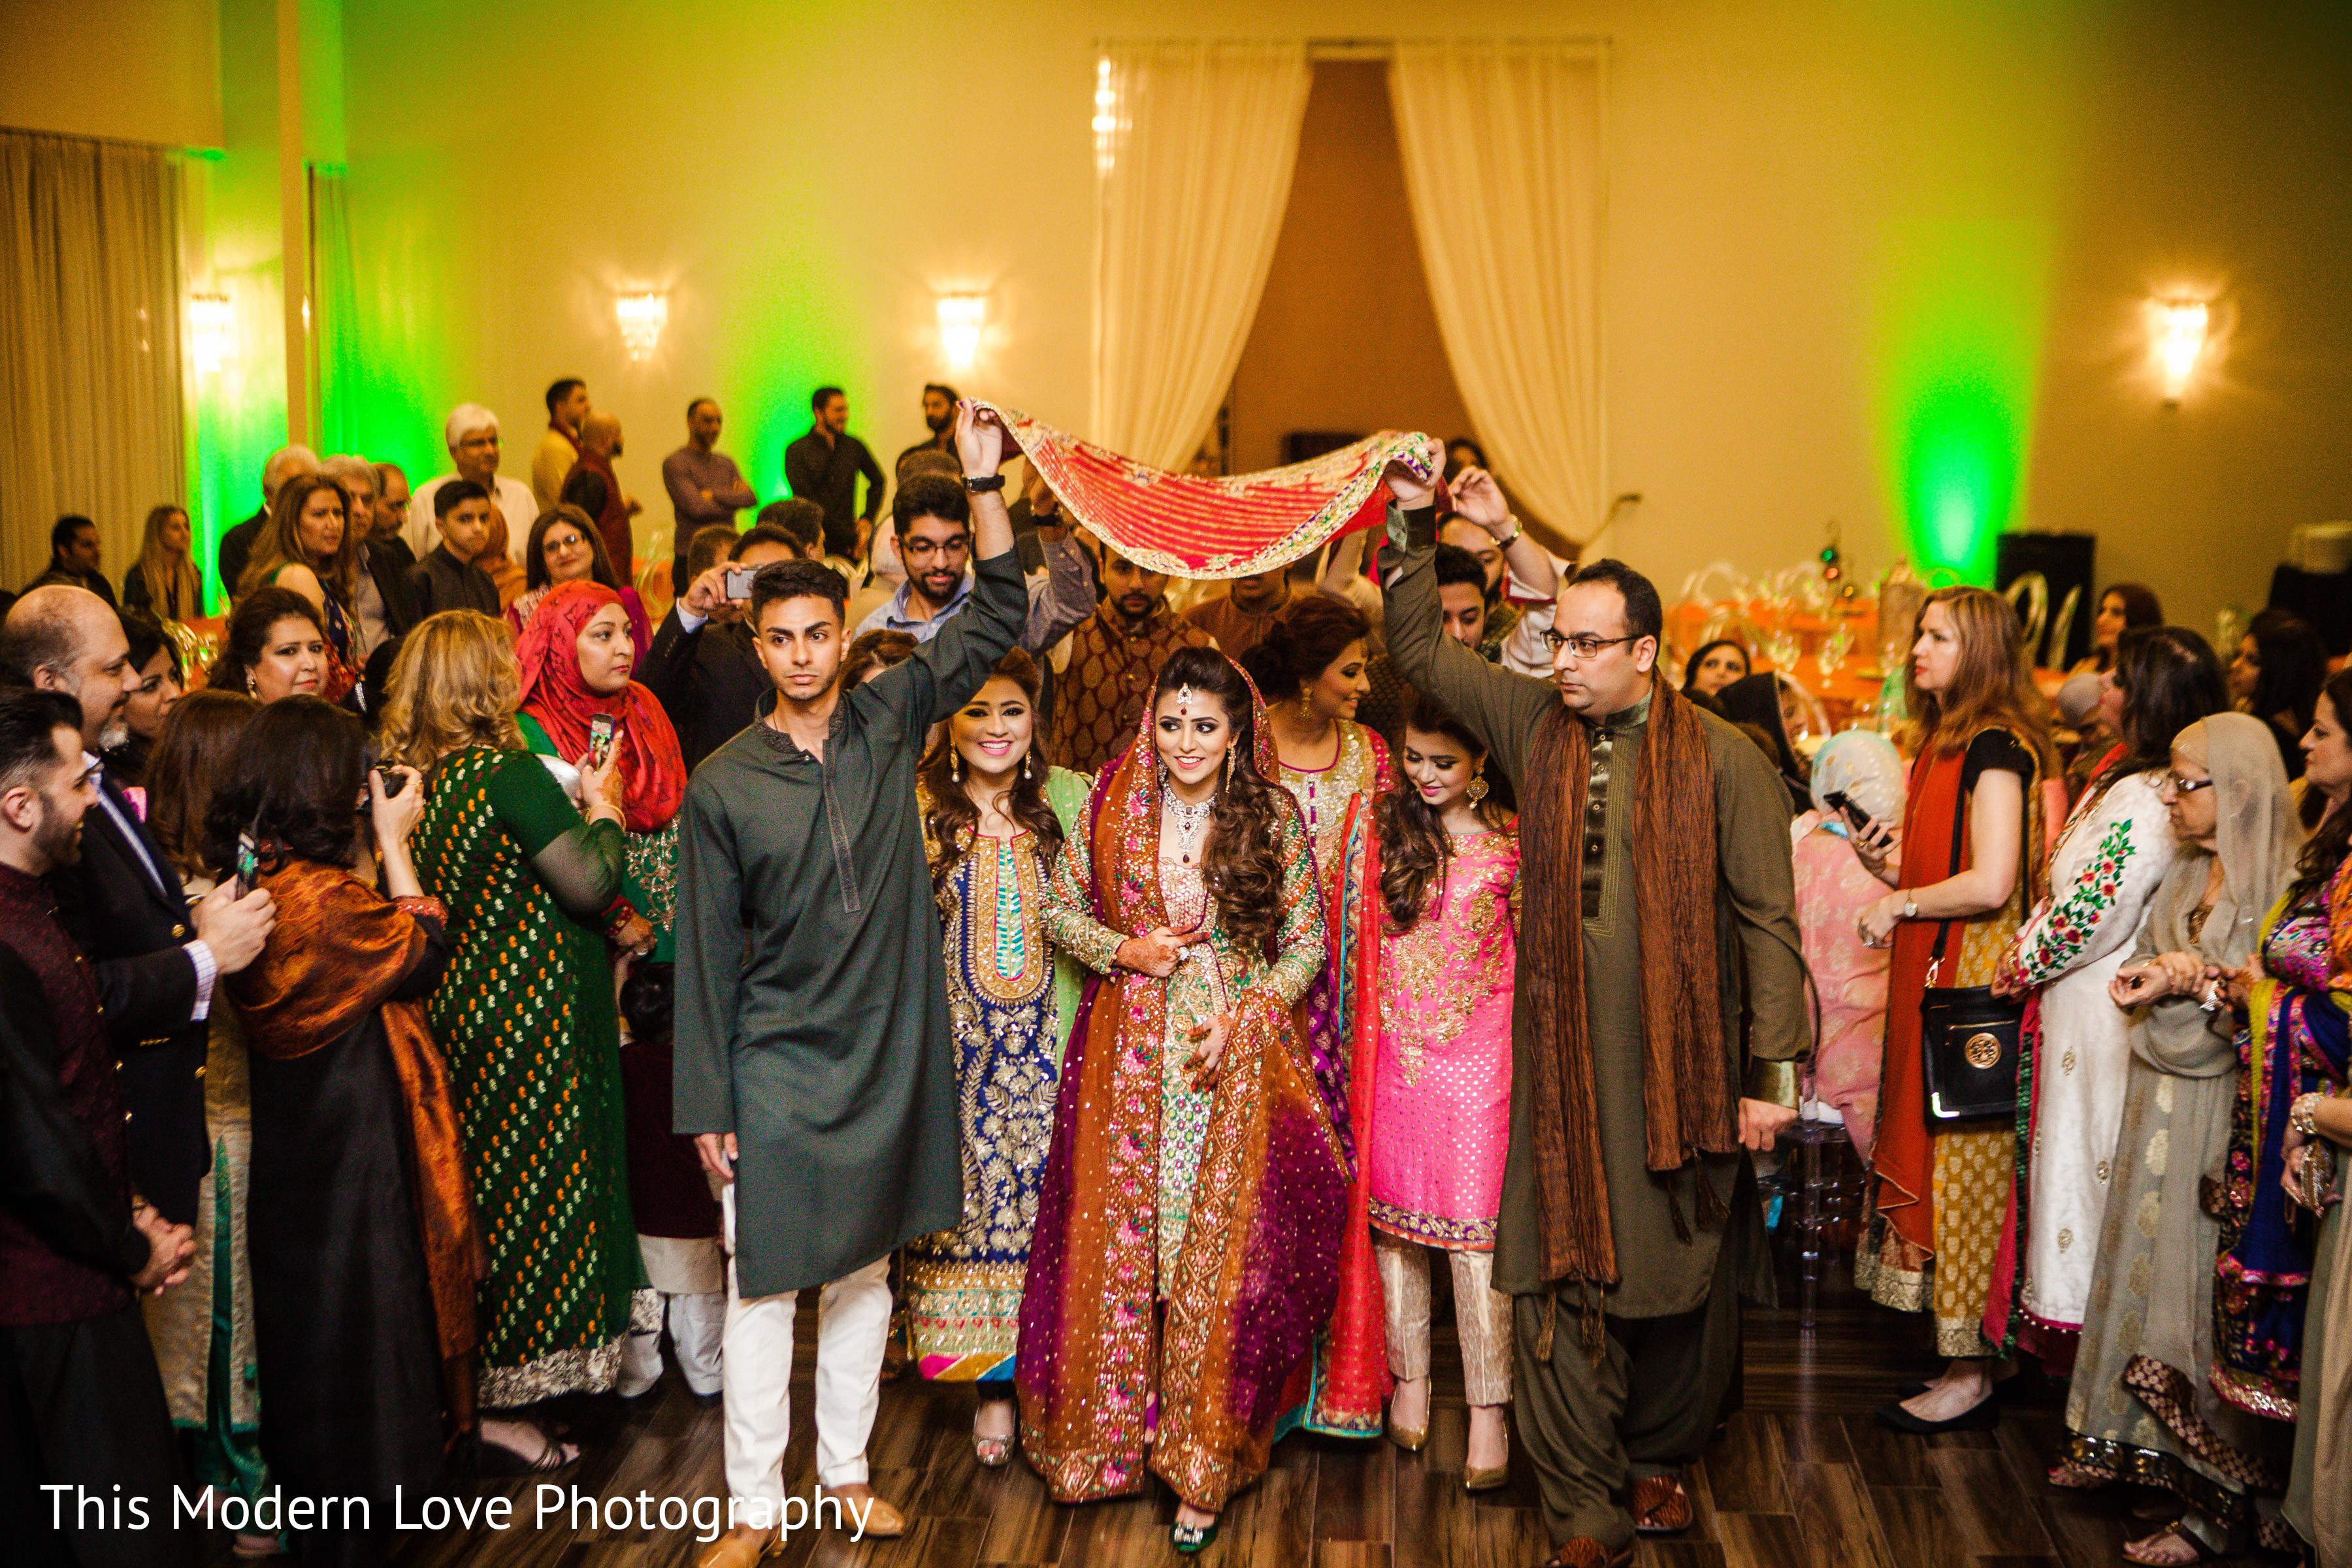 Pakistani pre wedding celebration | Photo 69570